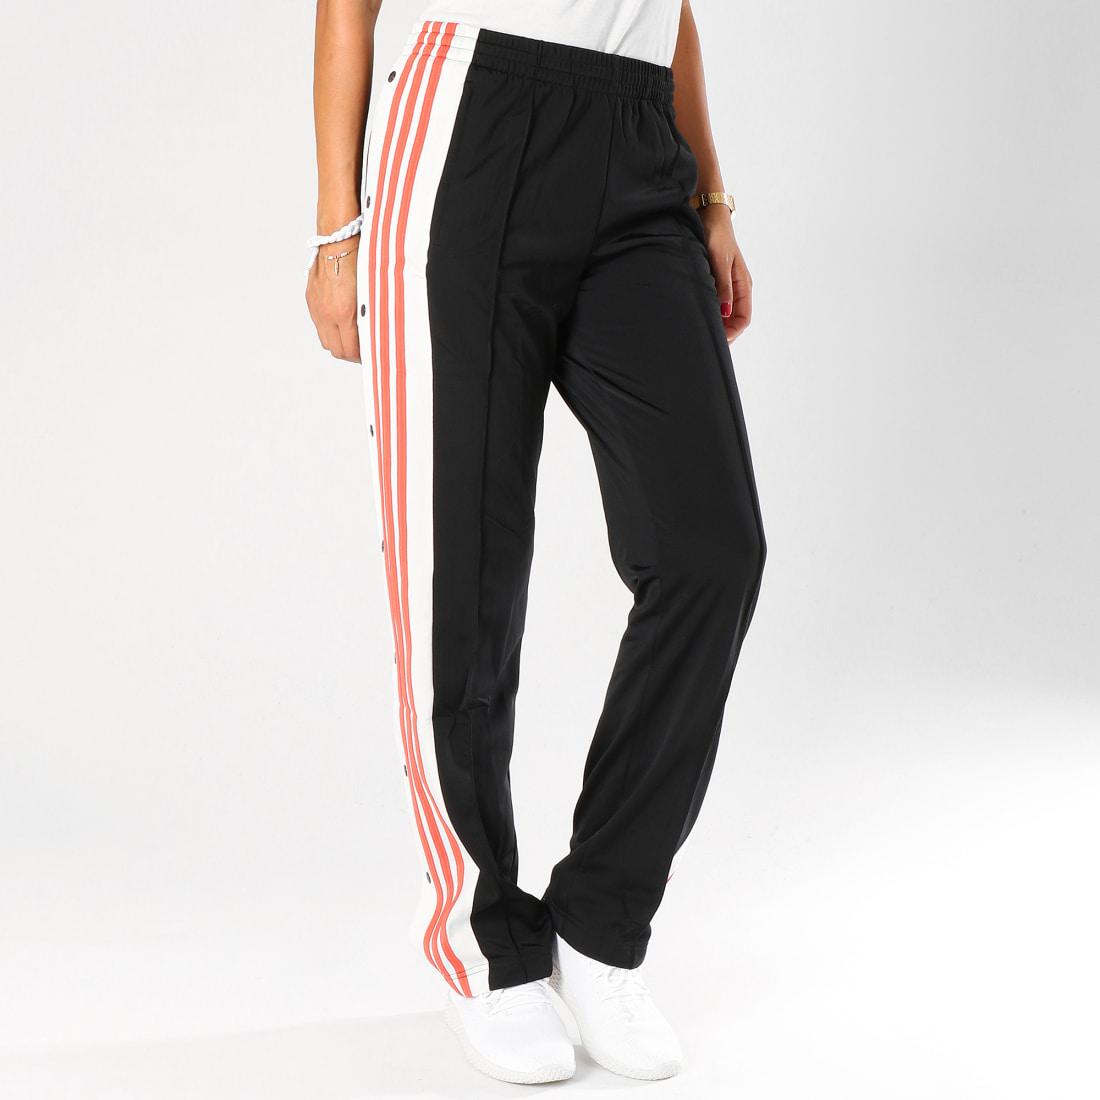 adidas Pantalon Jogging Avec Bandes Femme Original DH4677